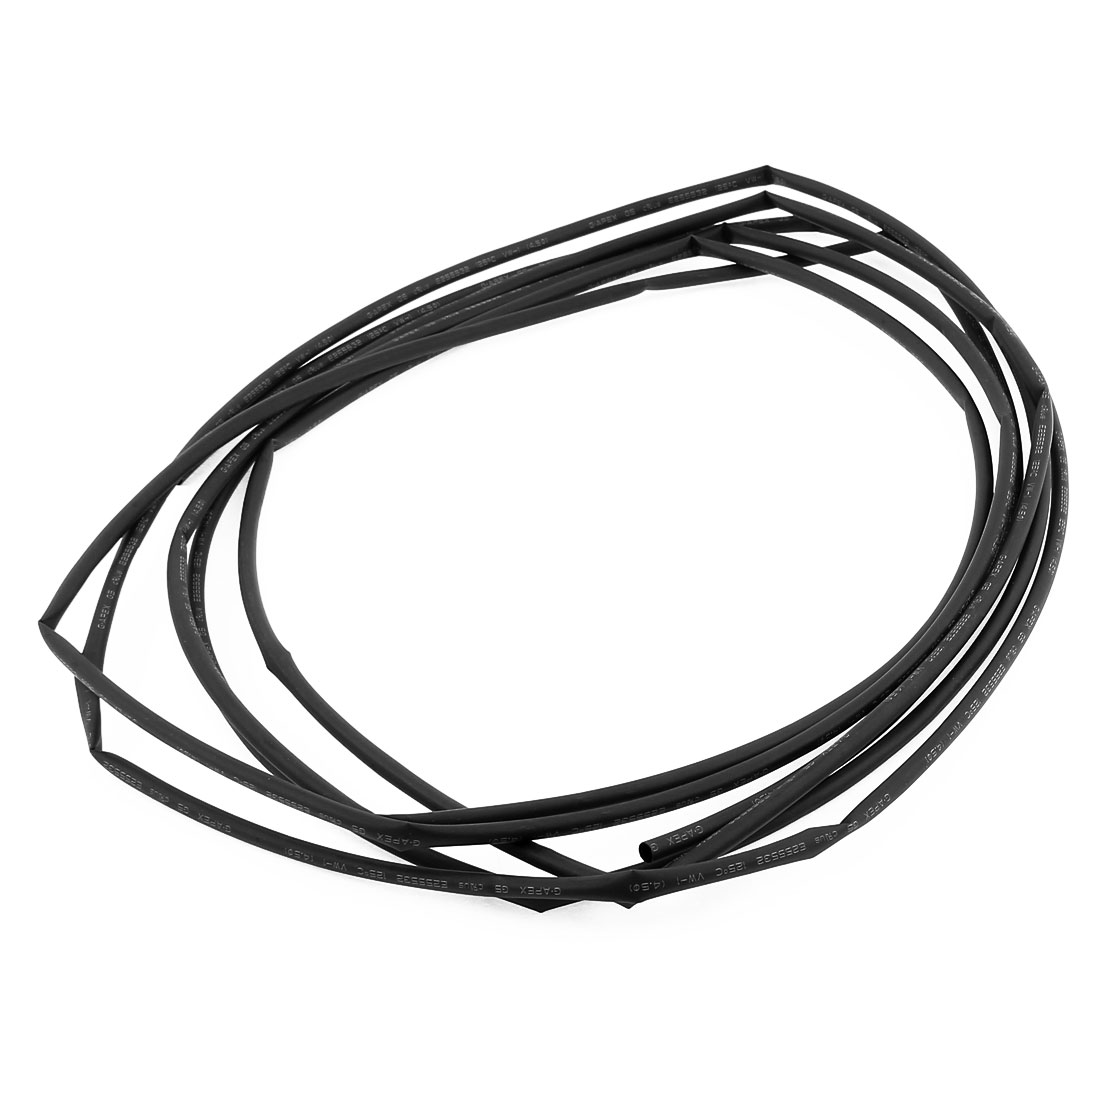 5m 4.5mm Diameter 2:1 Shrinkage Ratio Insulated Heat Shrink Tubing Black